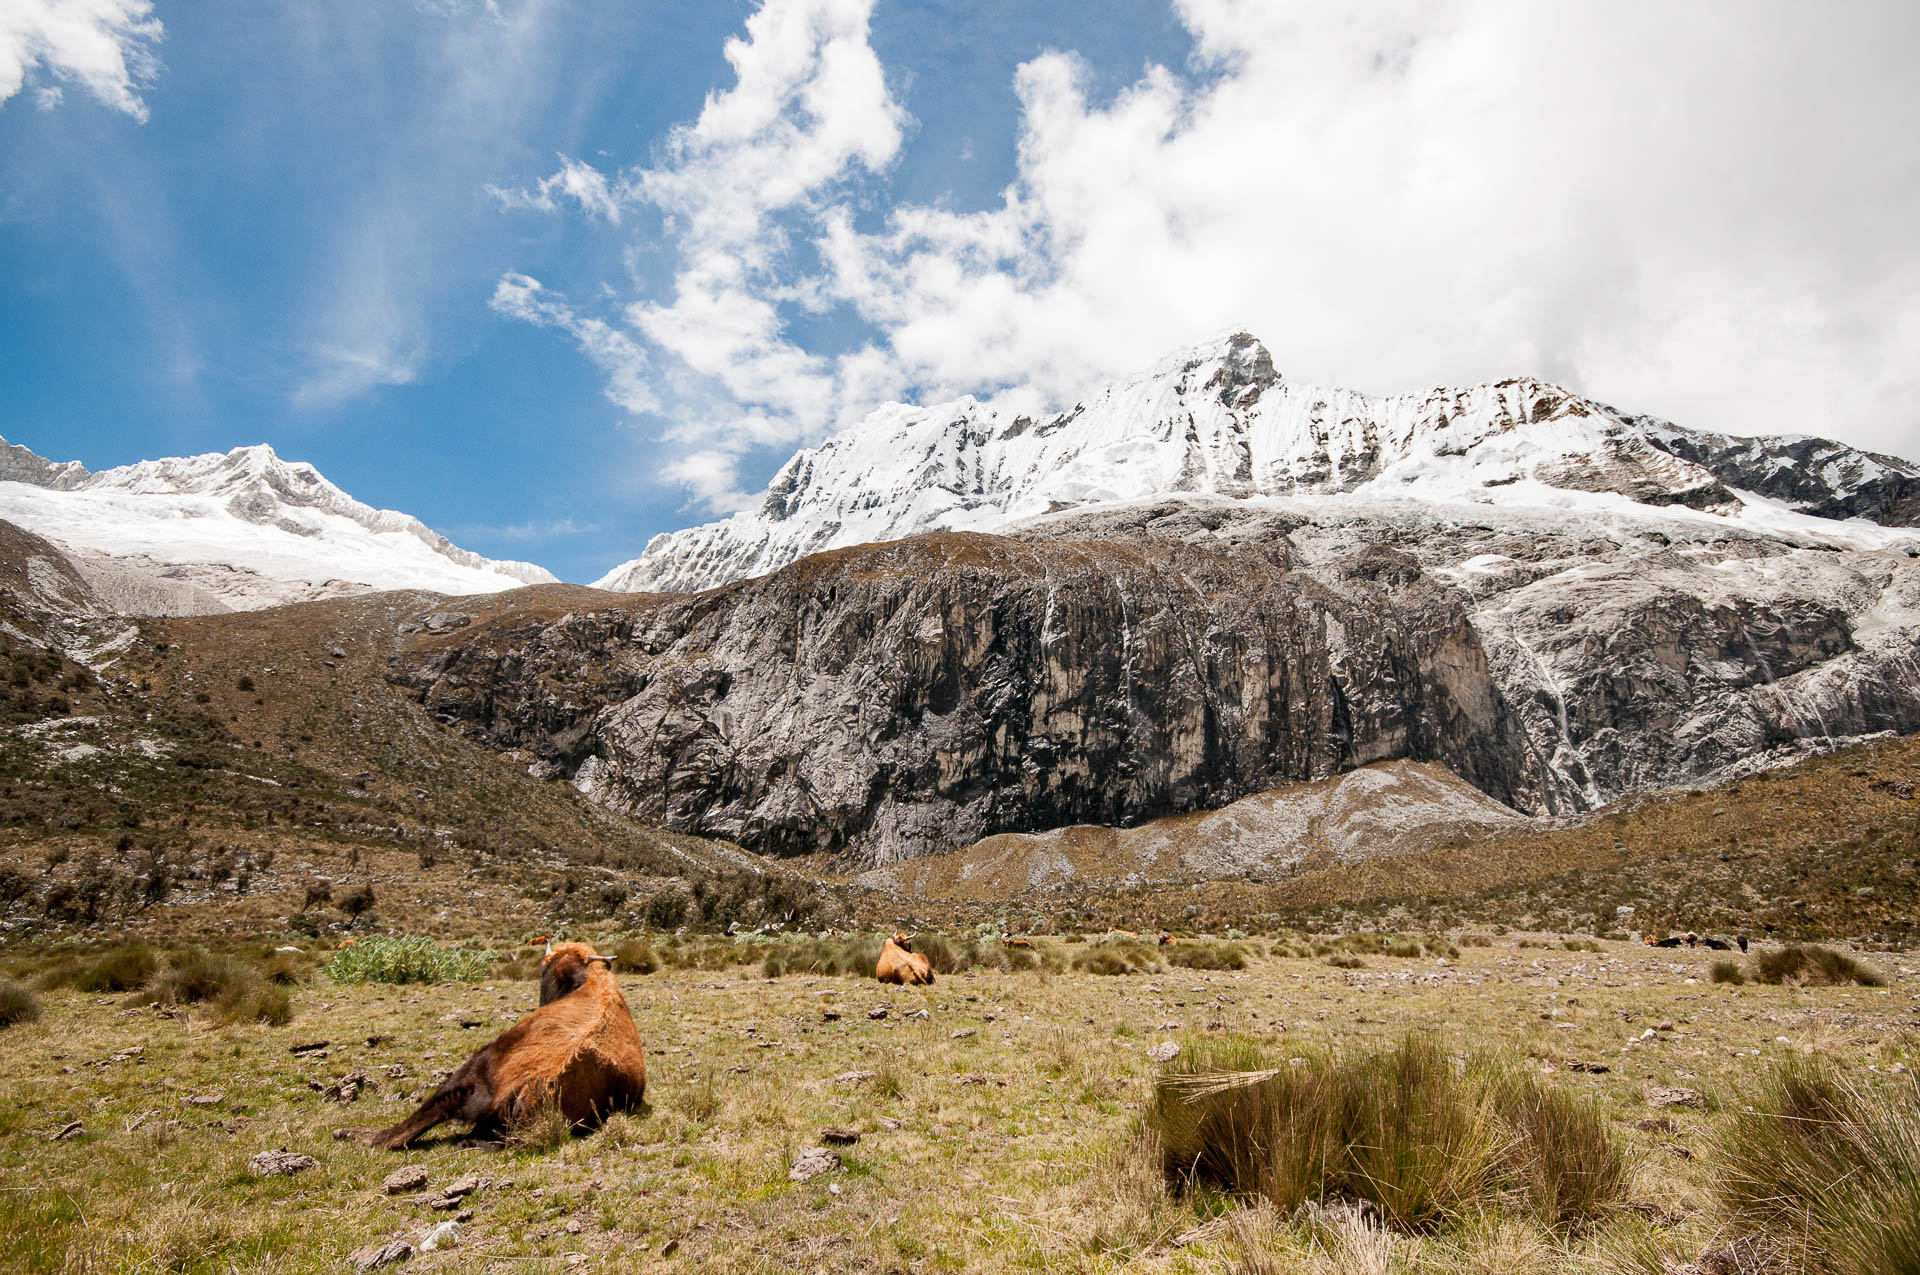 huaraz laguna 69 vaches - Les globe blogueurs - blog voyage nature